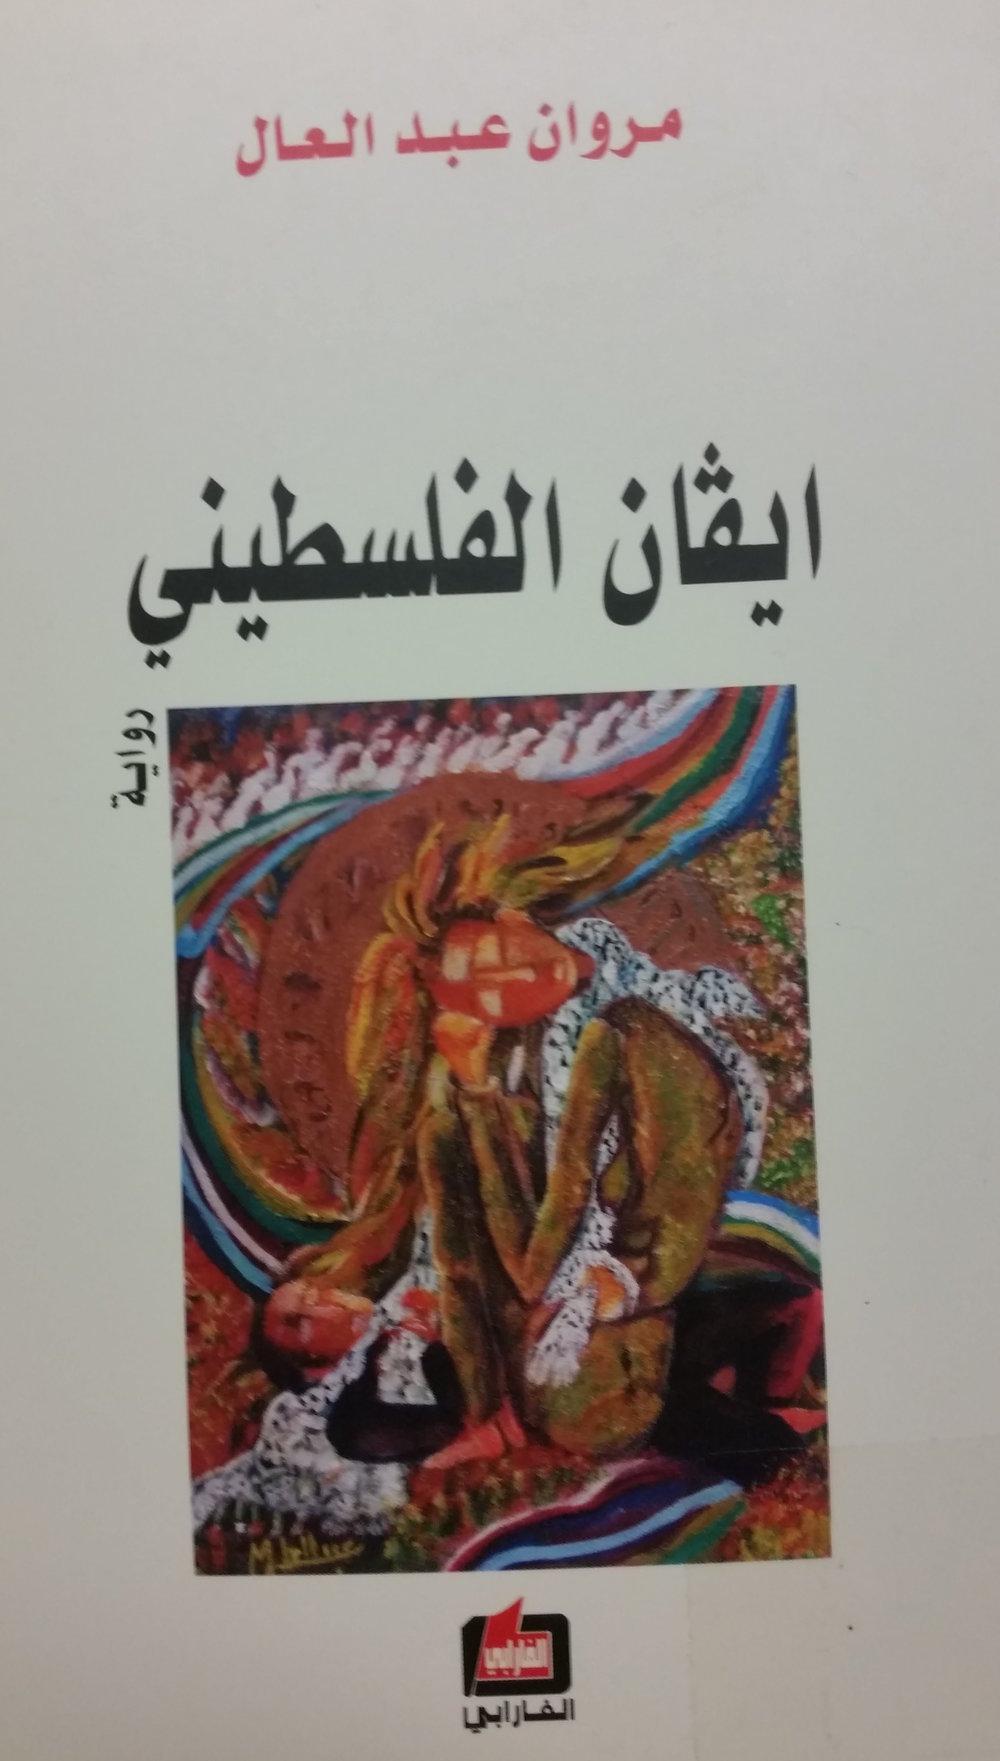 Marwān ʿAbd al-ʿĀl (Bayrūt : Dār al-Fārābī, 2011)